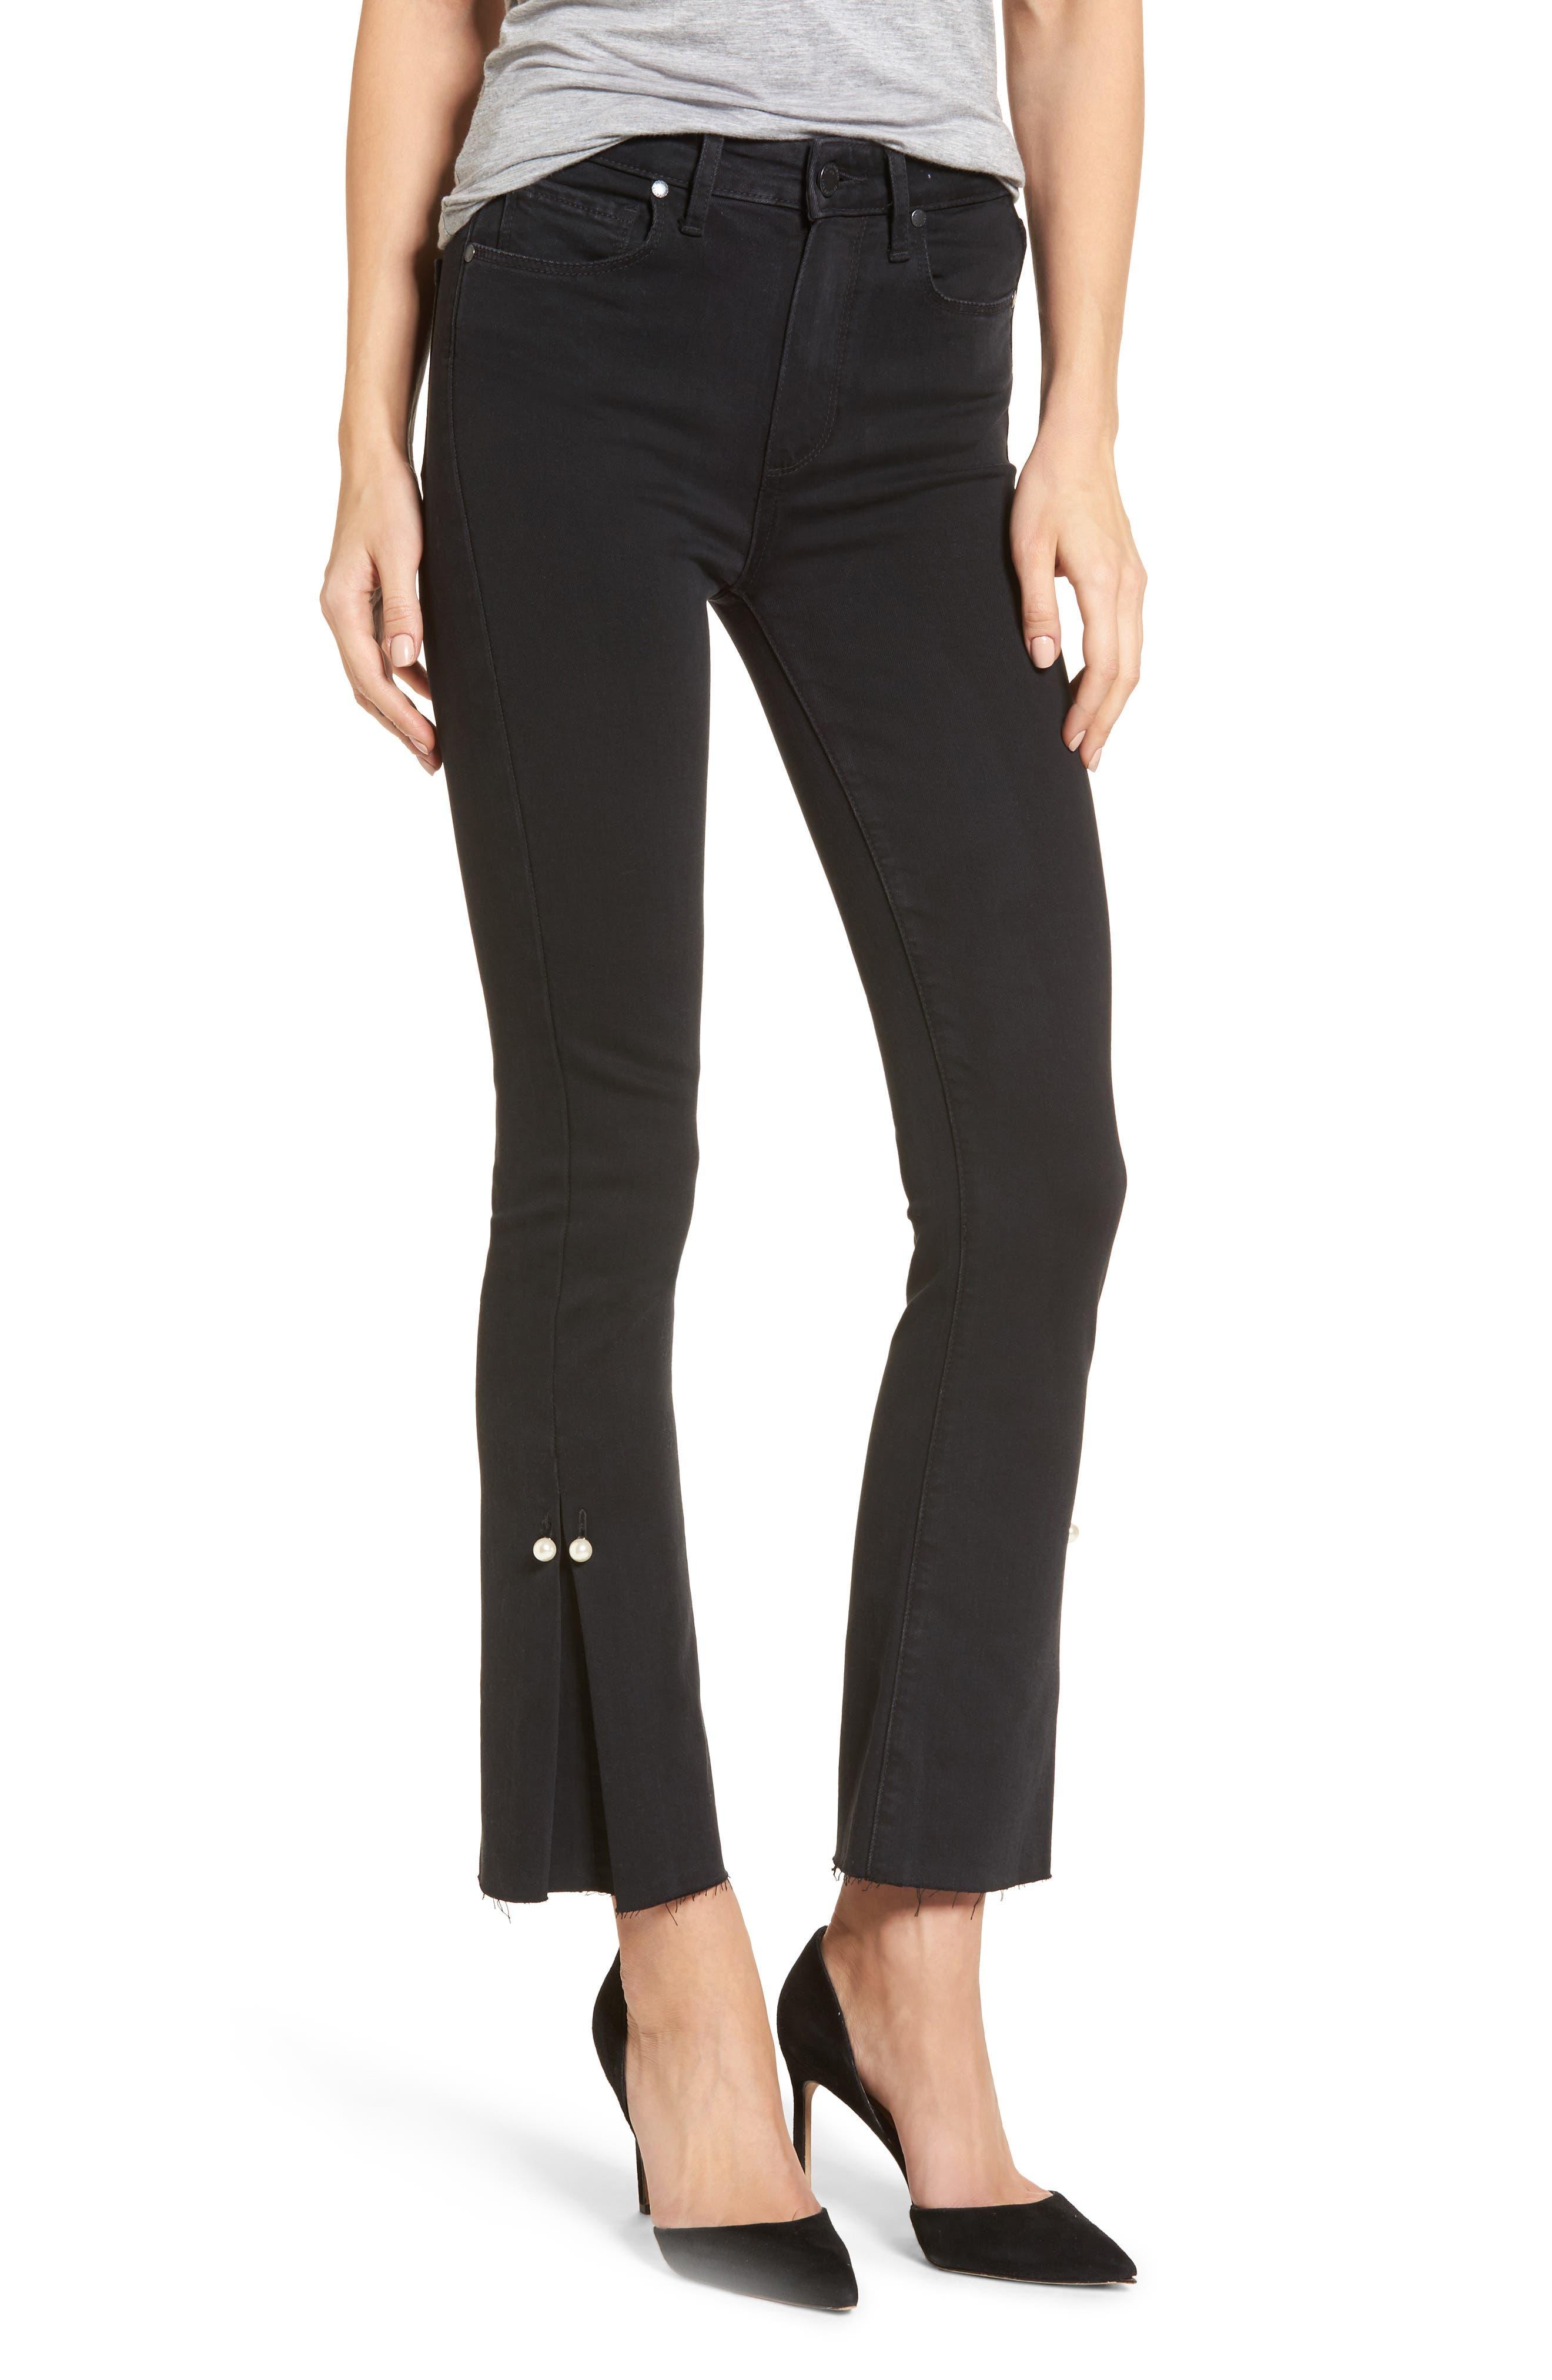 Transcend - Colette High Waist Crop Flare Jeans,                         Main,                         color, 001